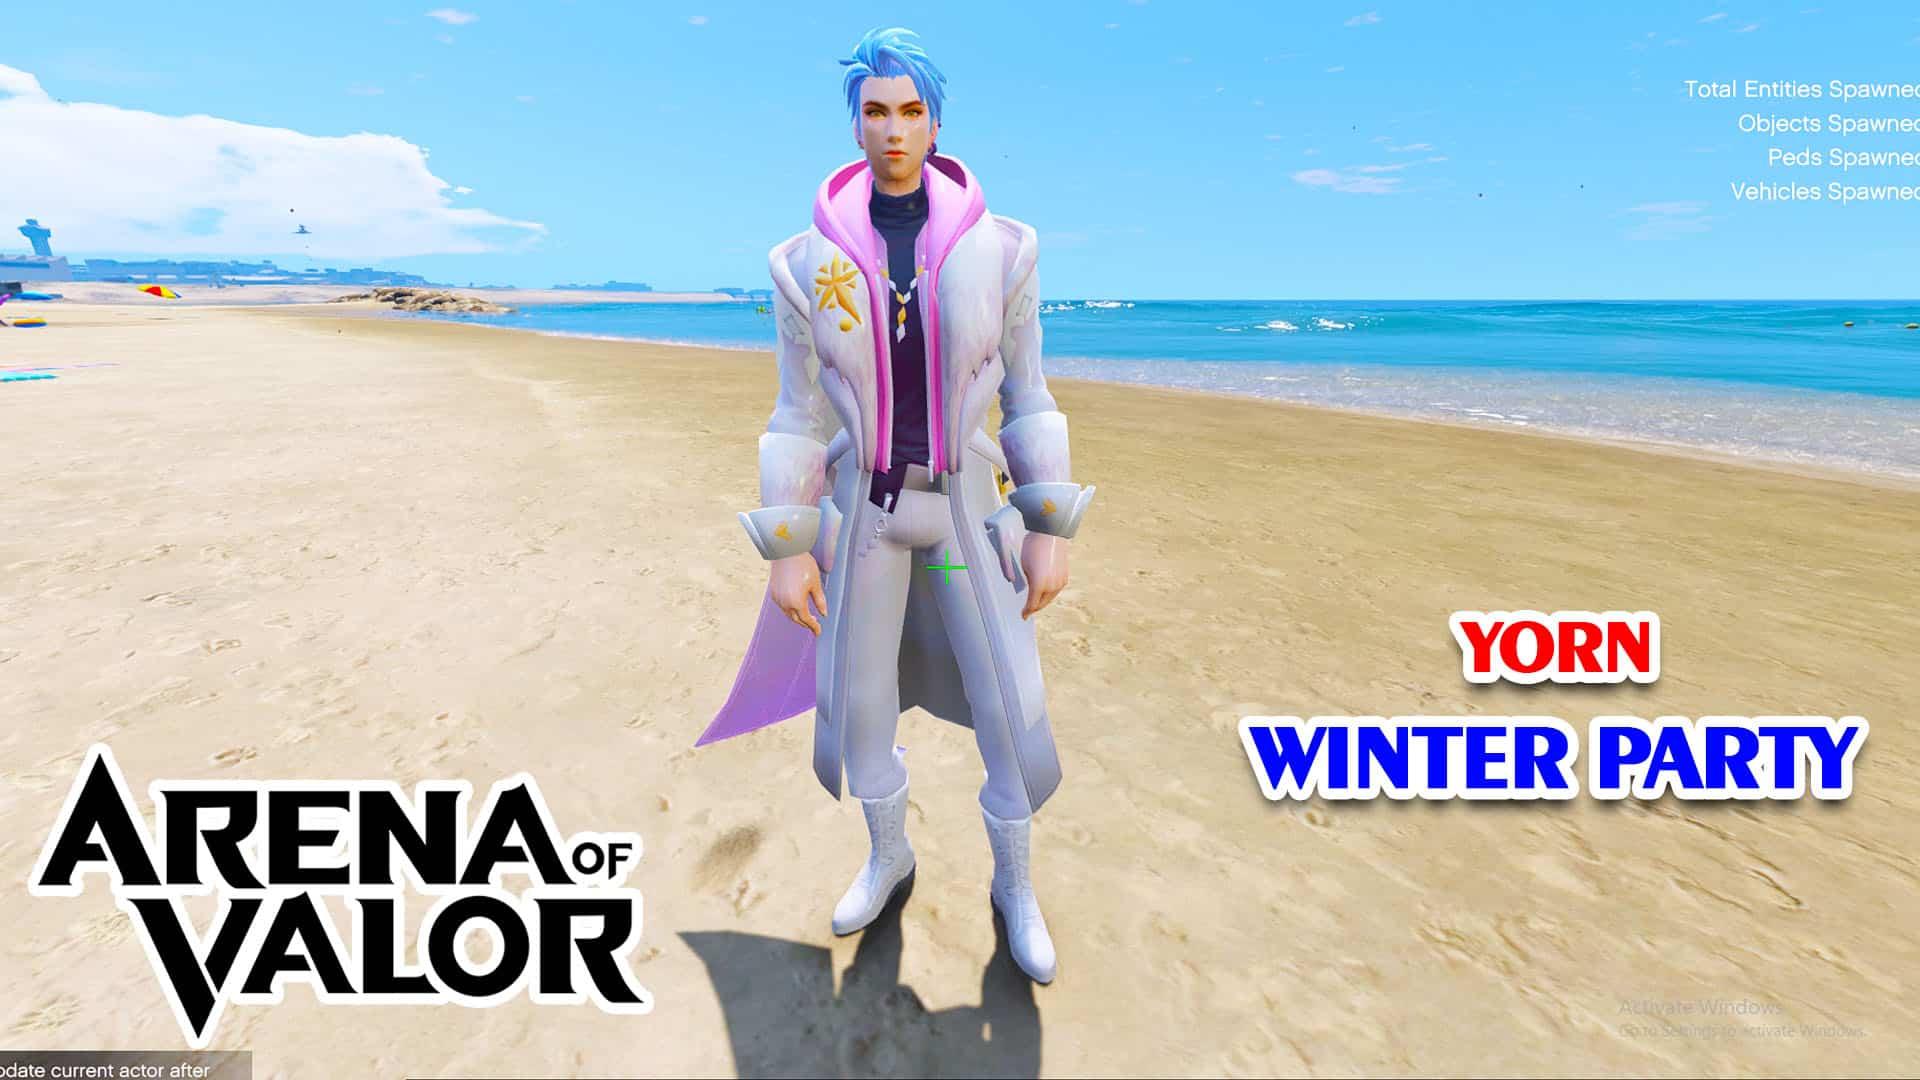 GTA 5 Mod Yorn Winter Party Arena of Valor